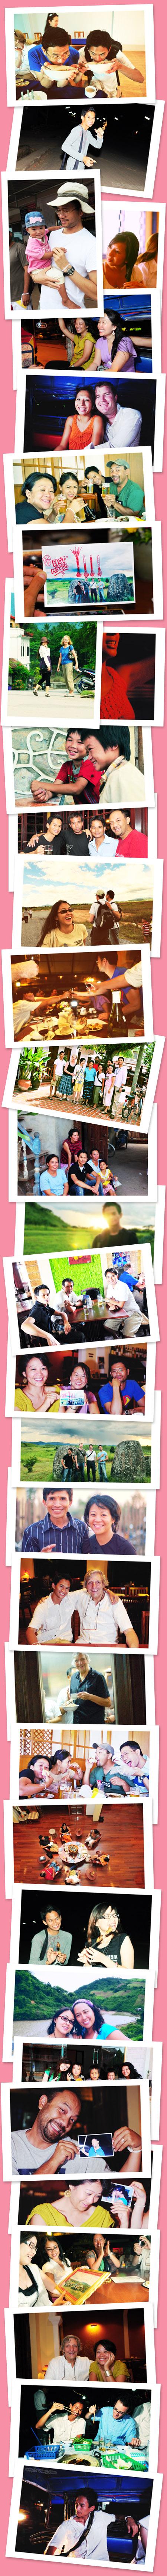 bvong_pix_laos_fun.jpg